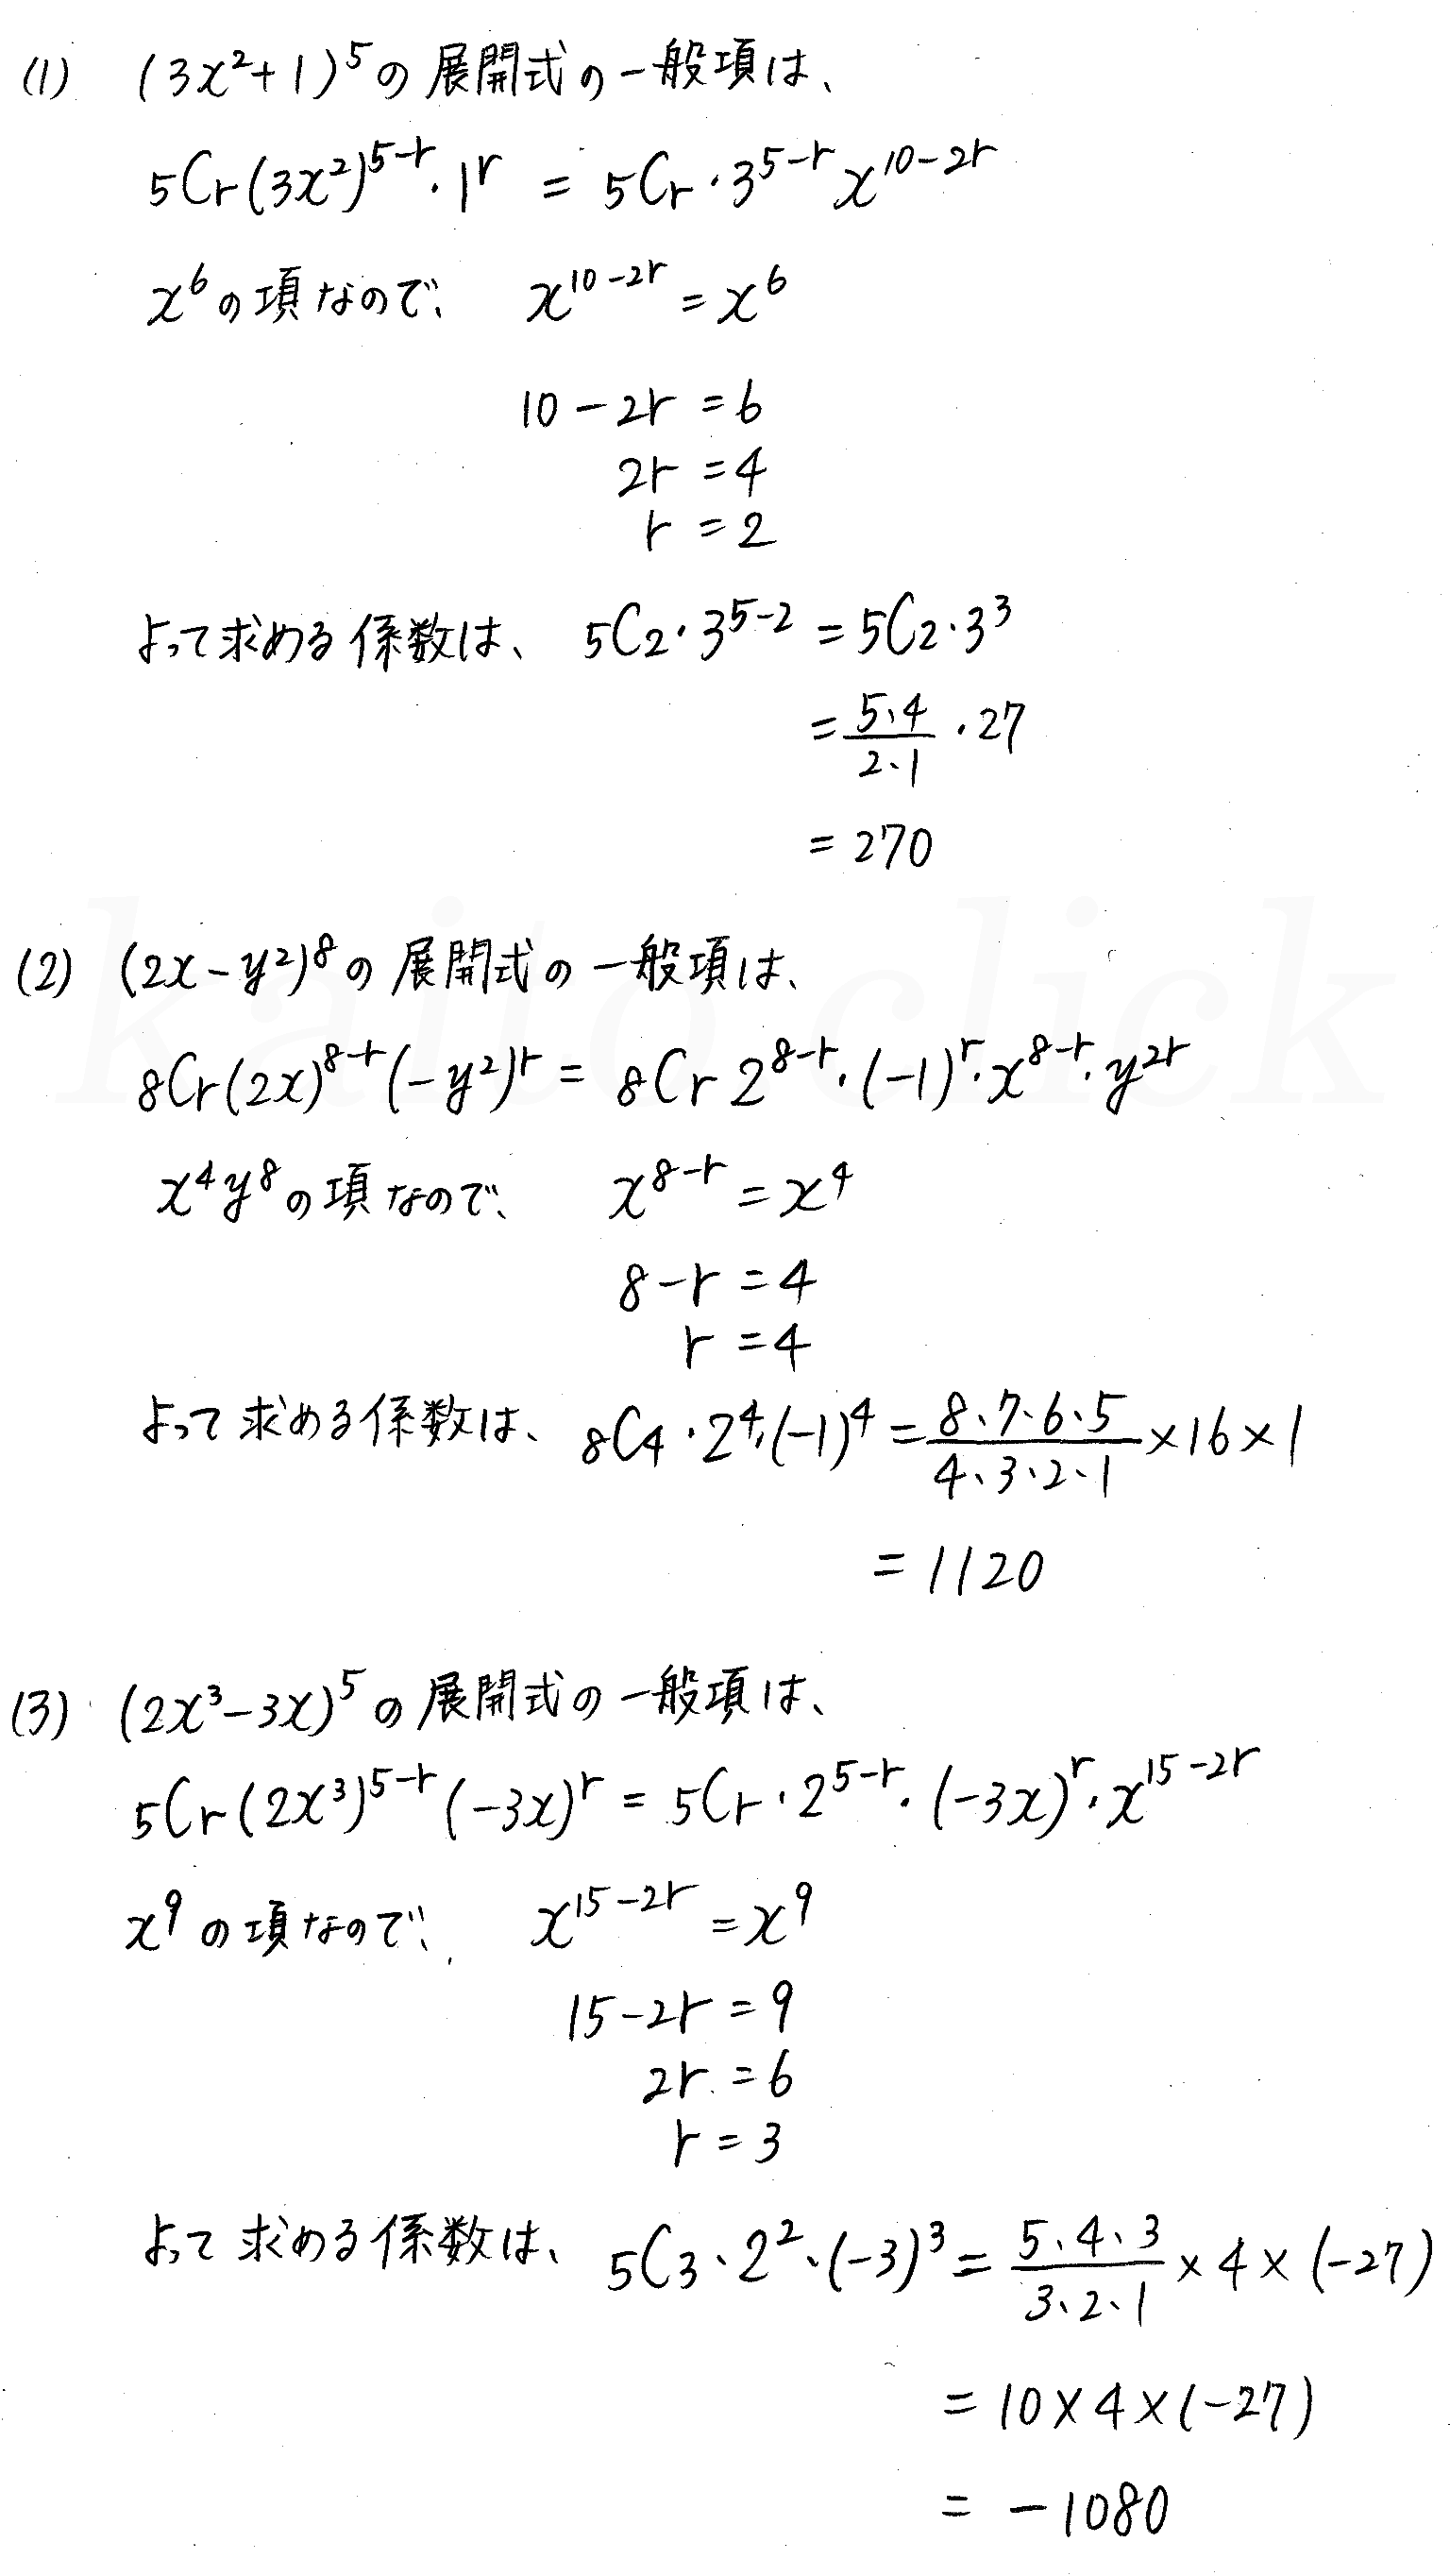 3TRIAL数学2-11解答